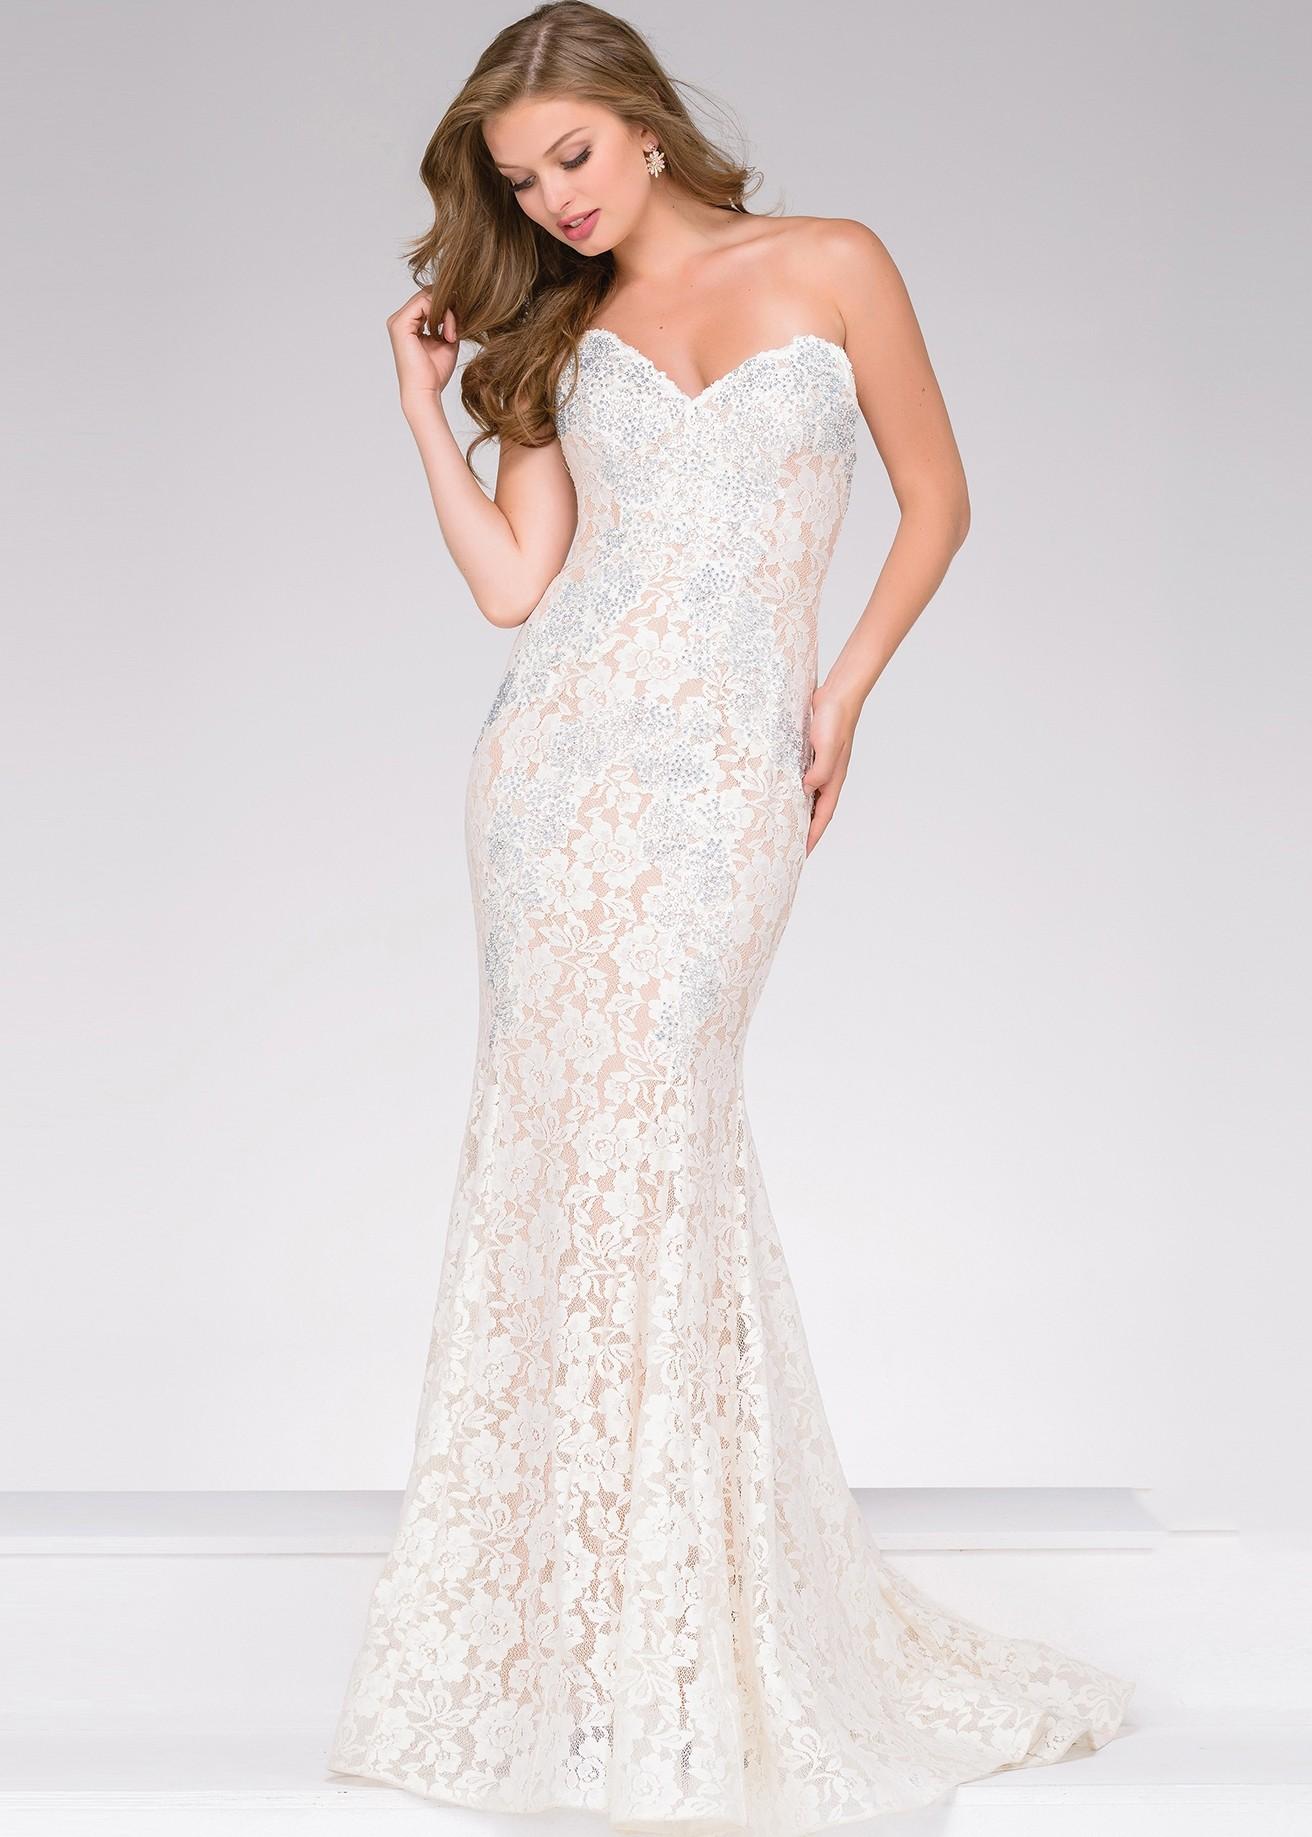 Jovani 37334 Strapless Jeweled Lace Formal Dress